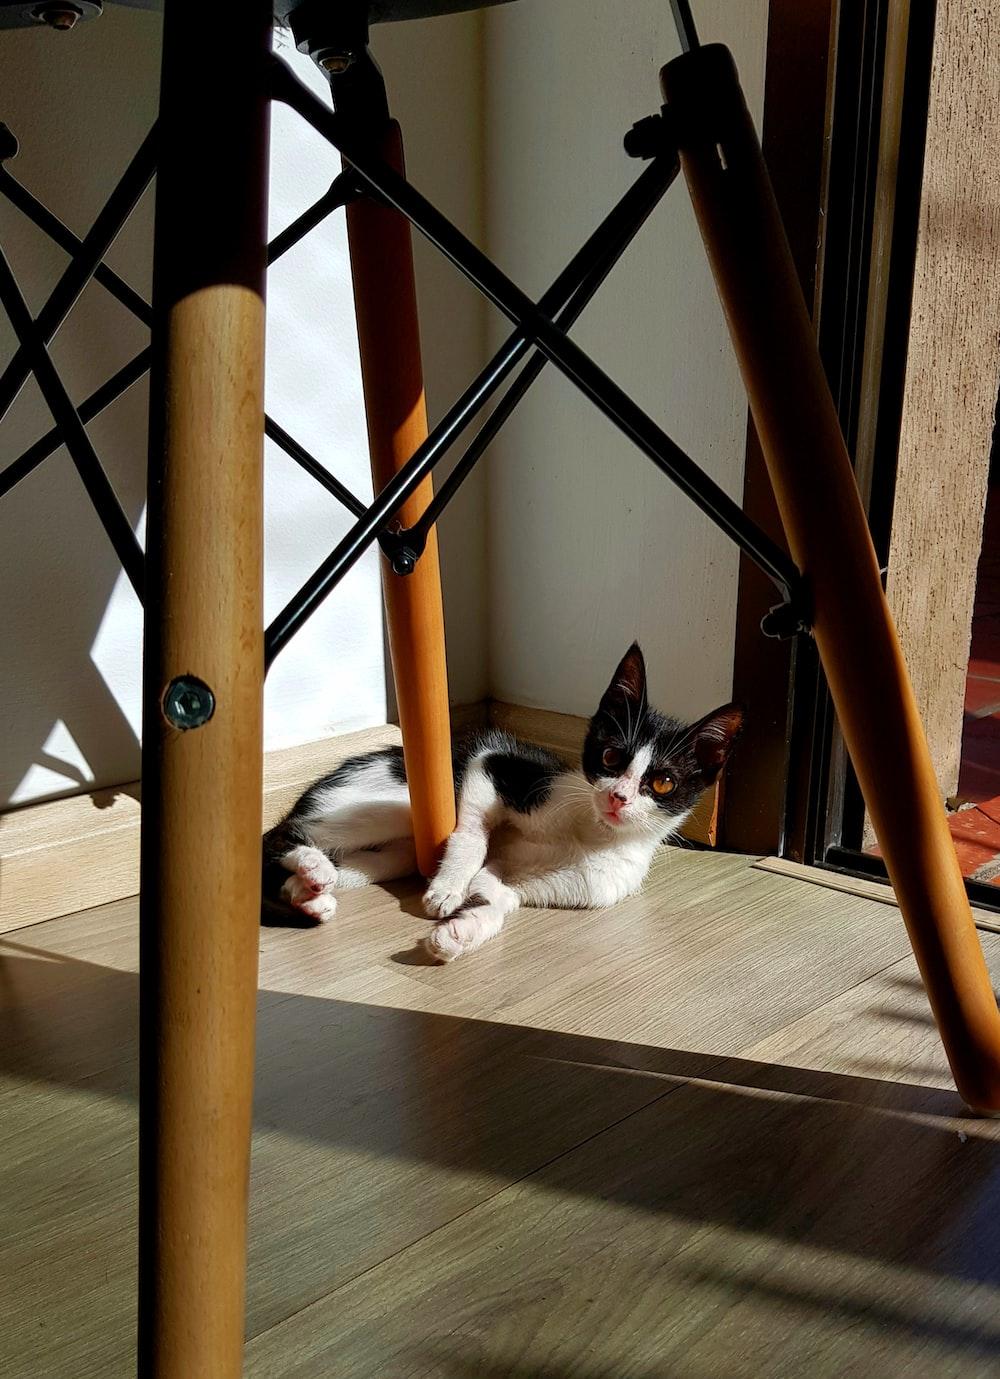 tuxedo cat lying on floor